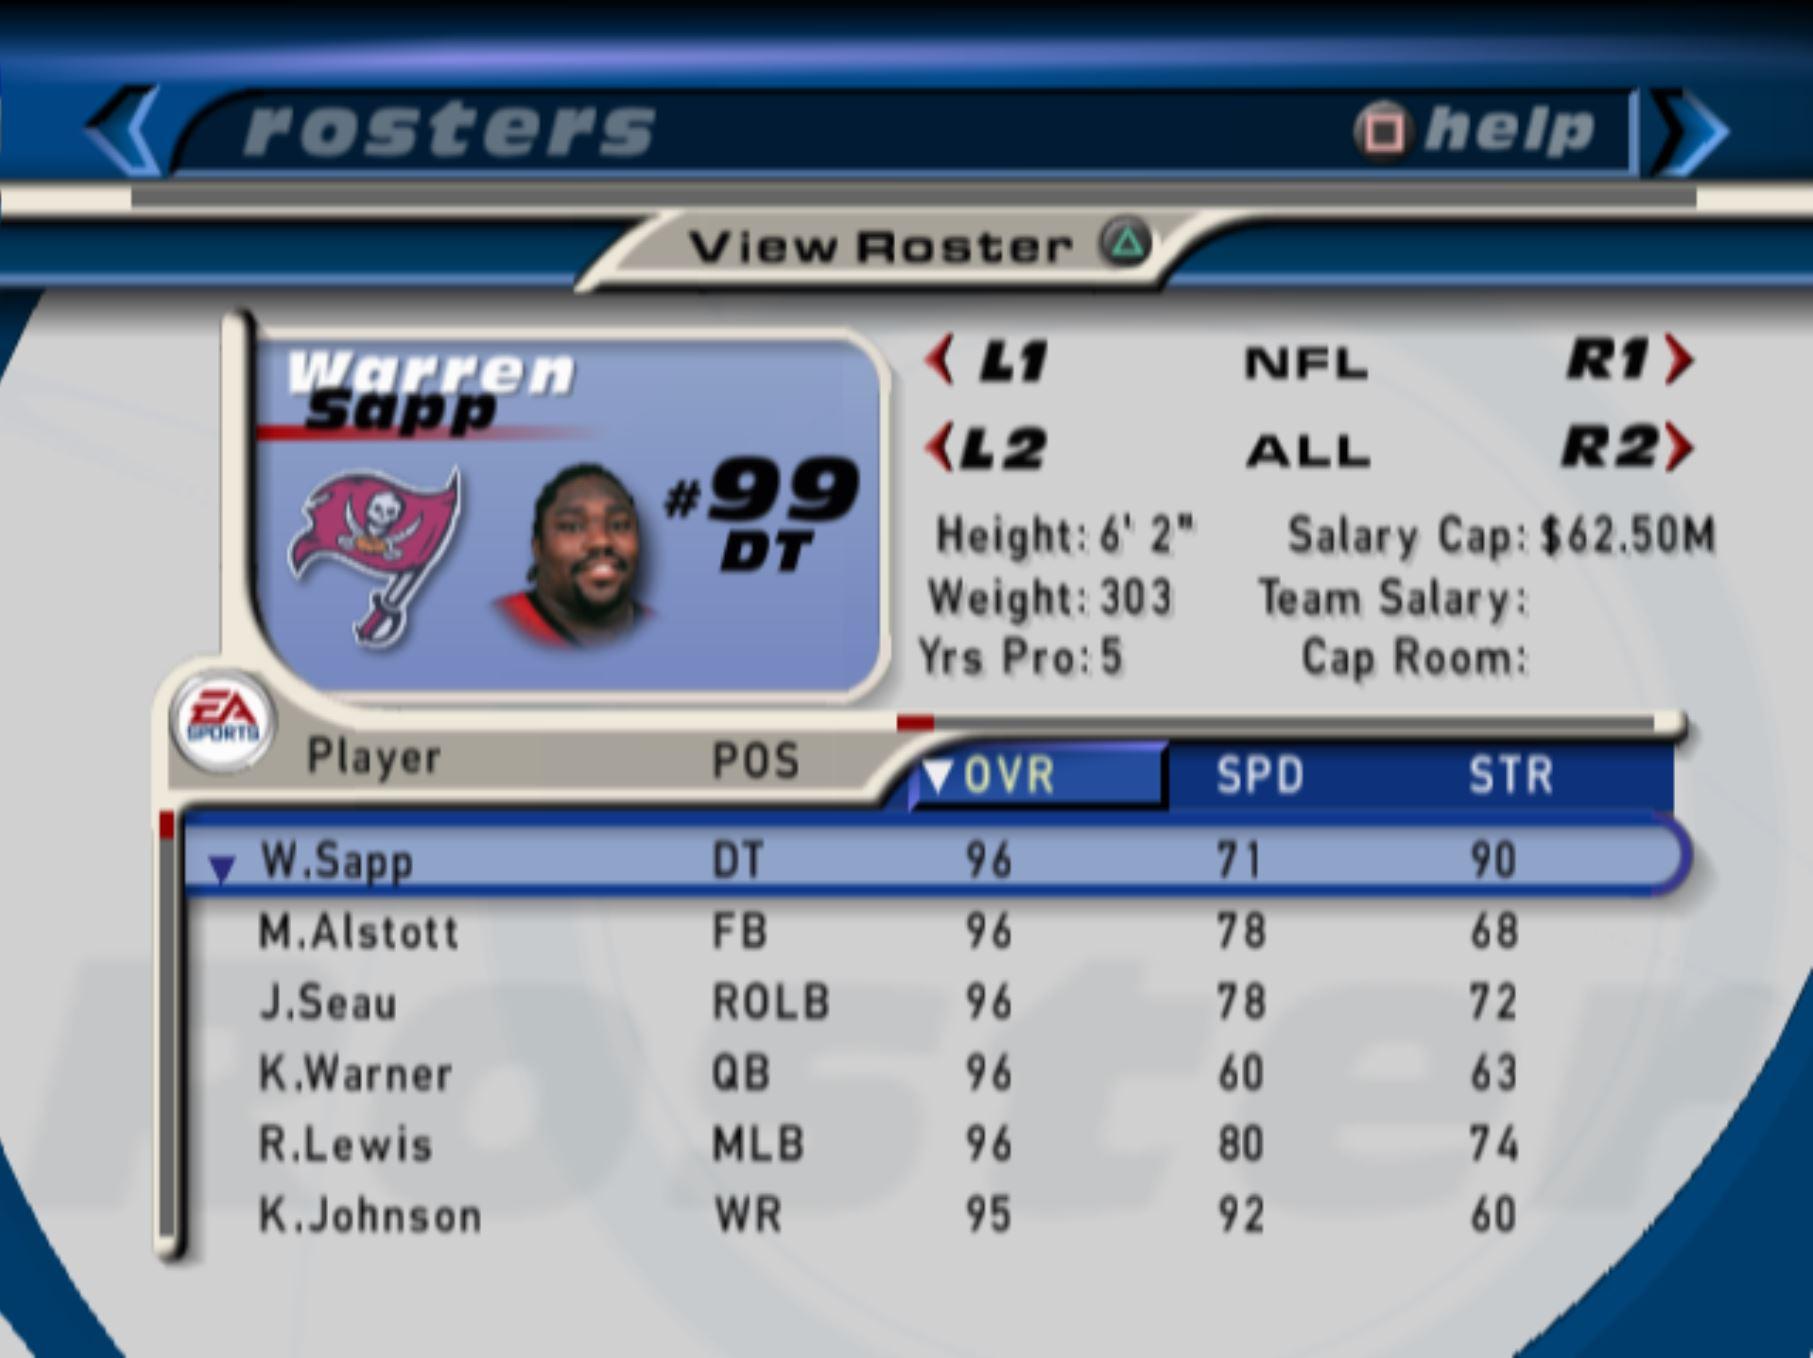 Madden 2001 best players